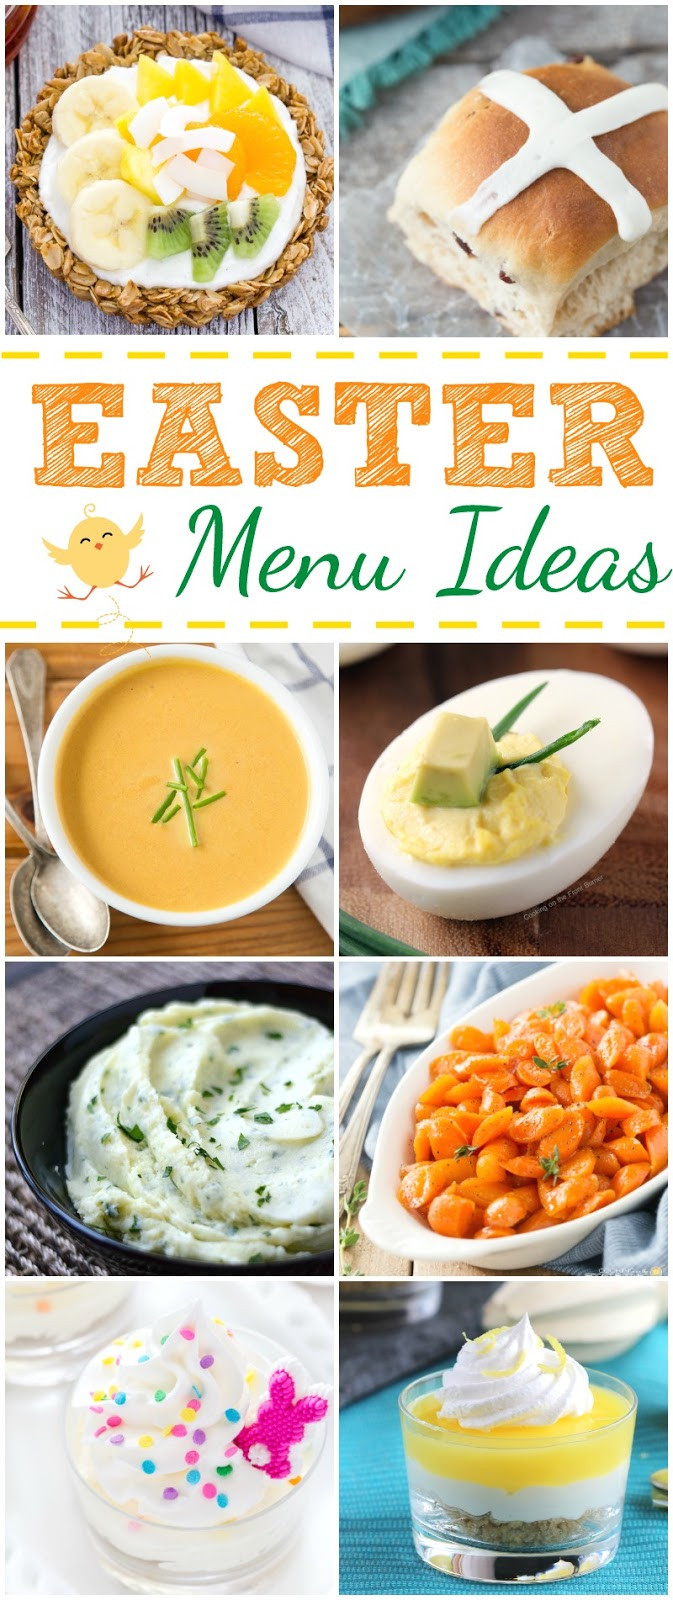 Easter Dinner Menus And Recipes  Easter Menu Ideas